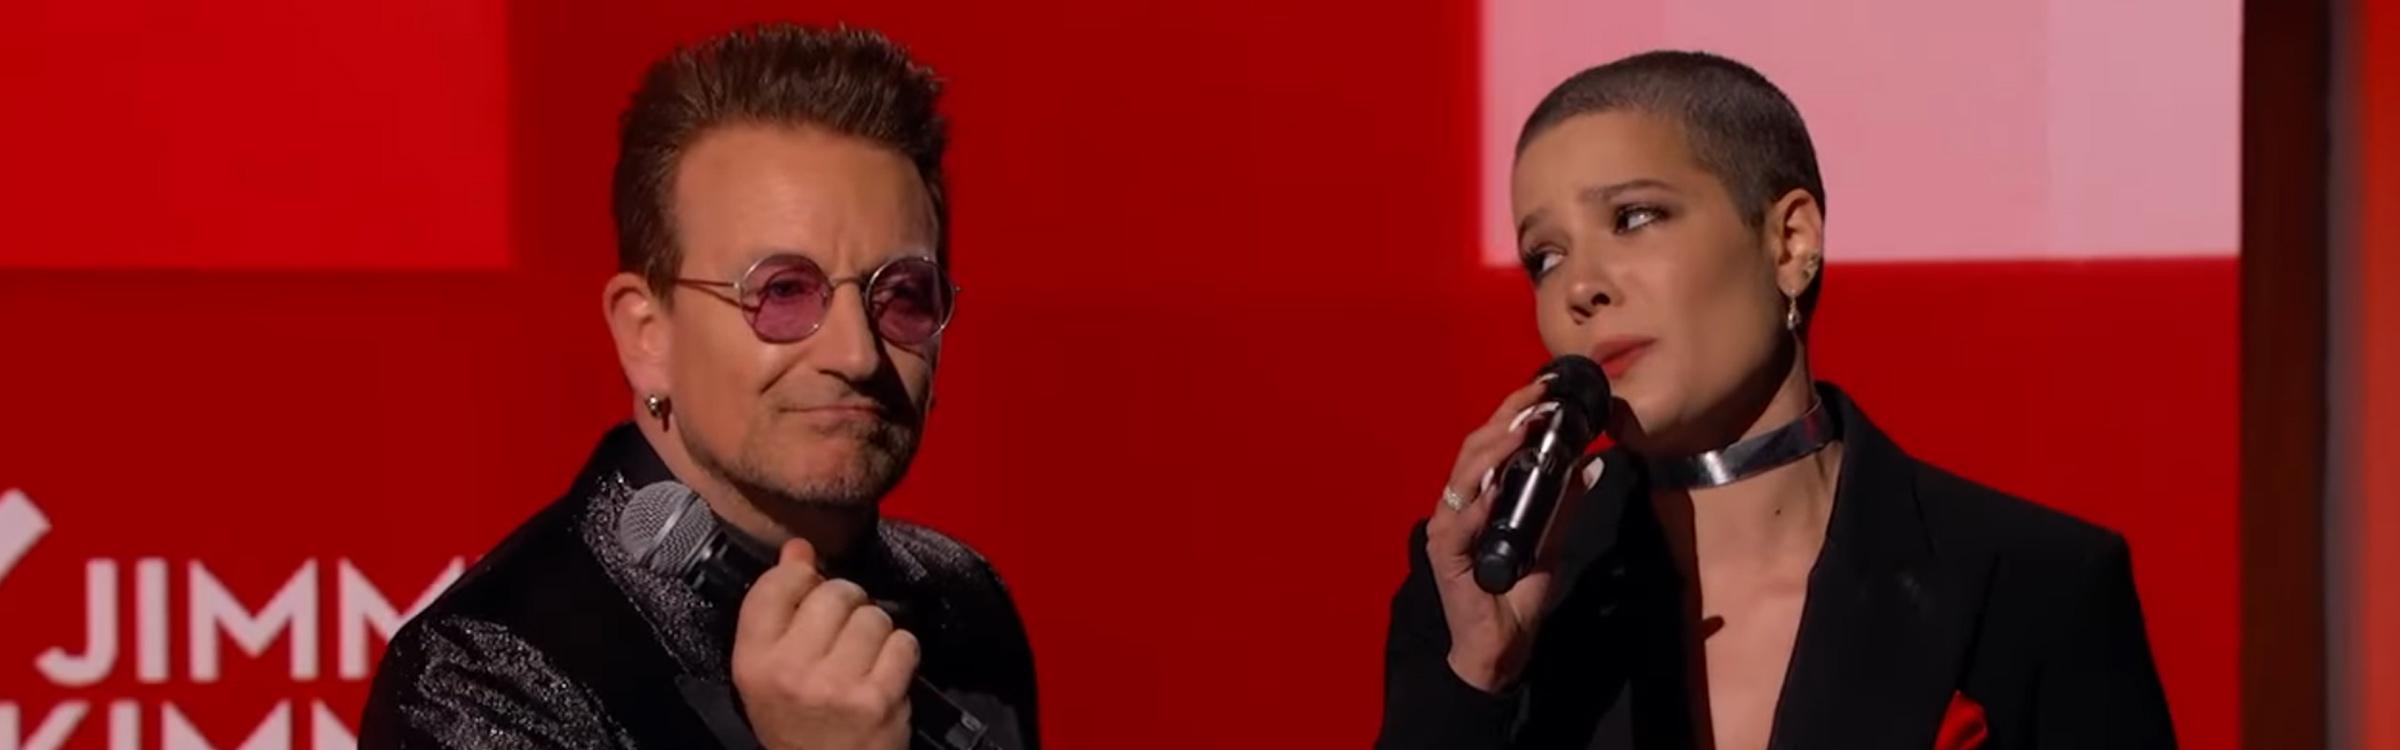 Bono halsey header